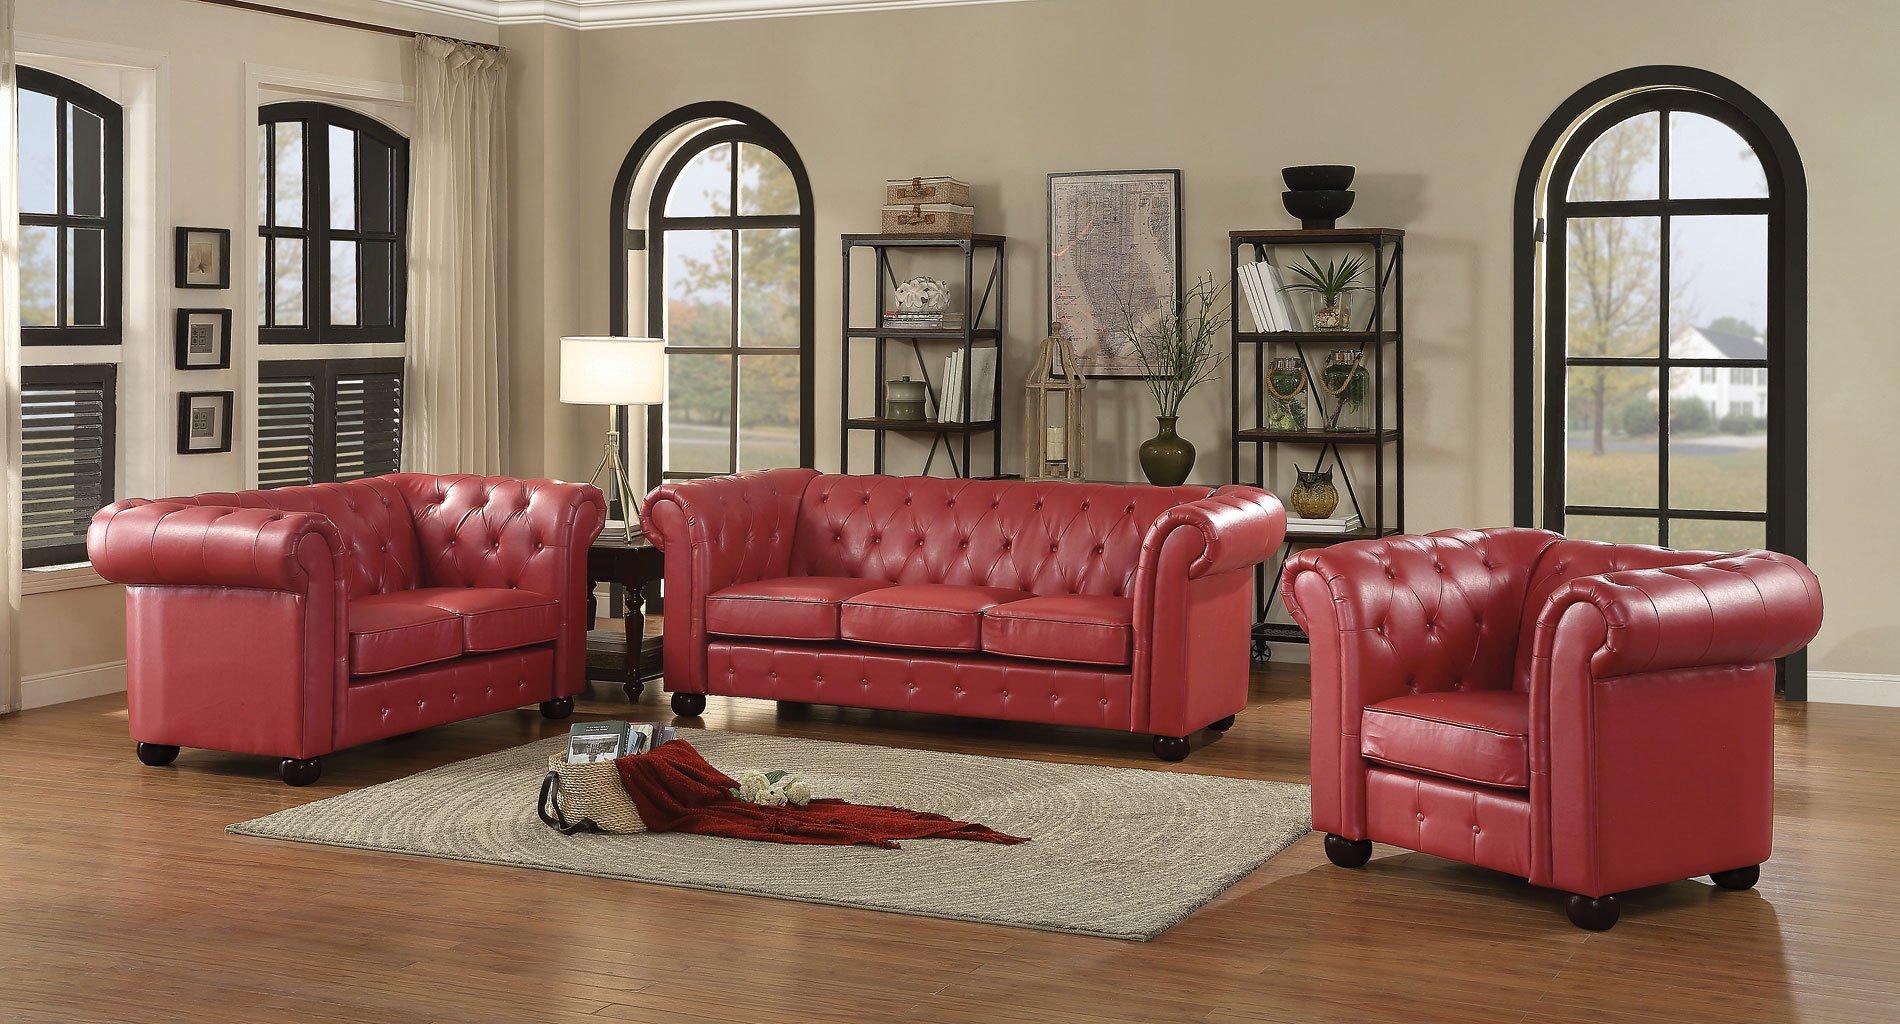 G495 tufted living room set red